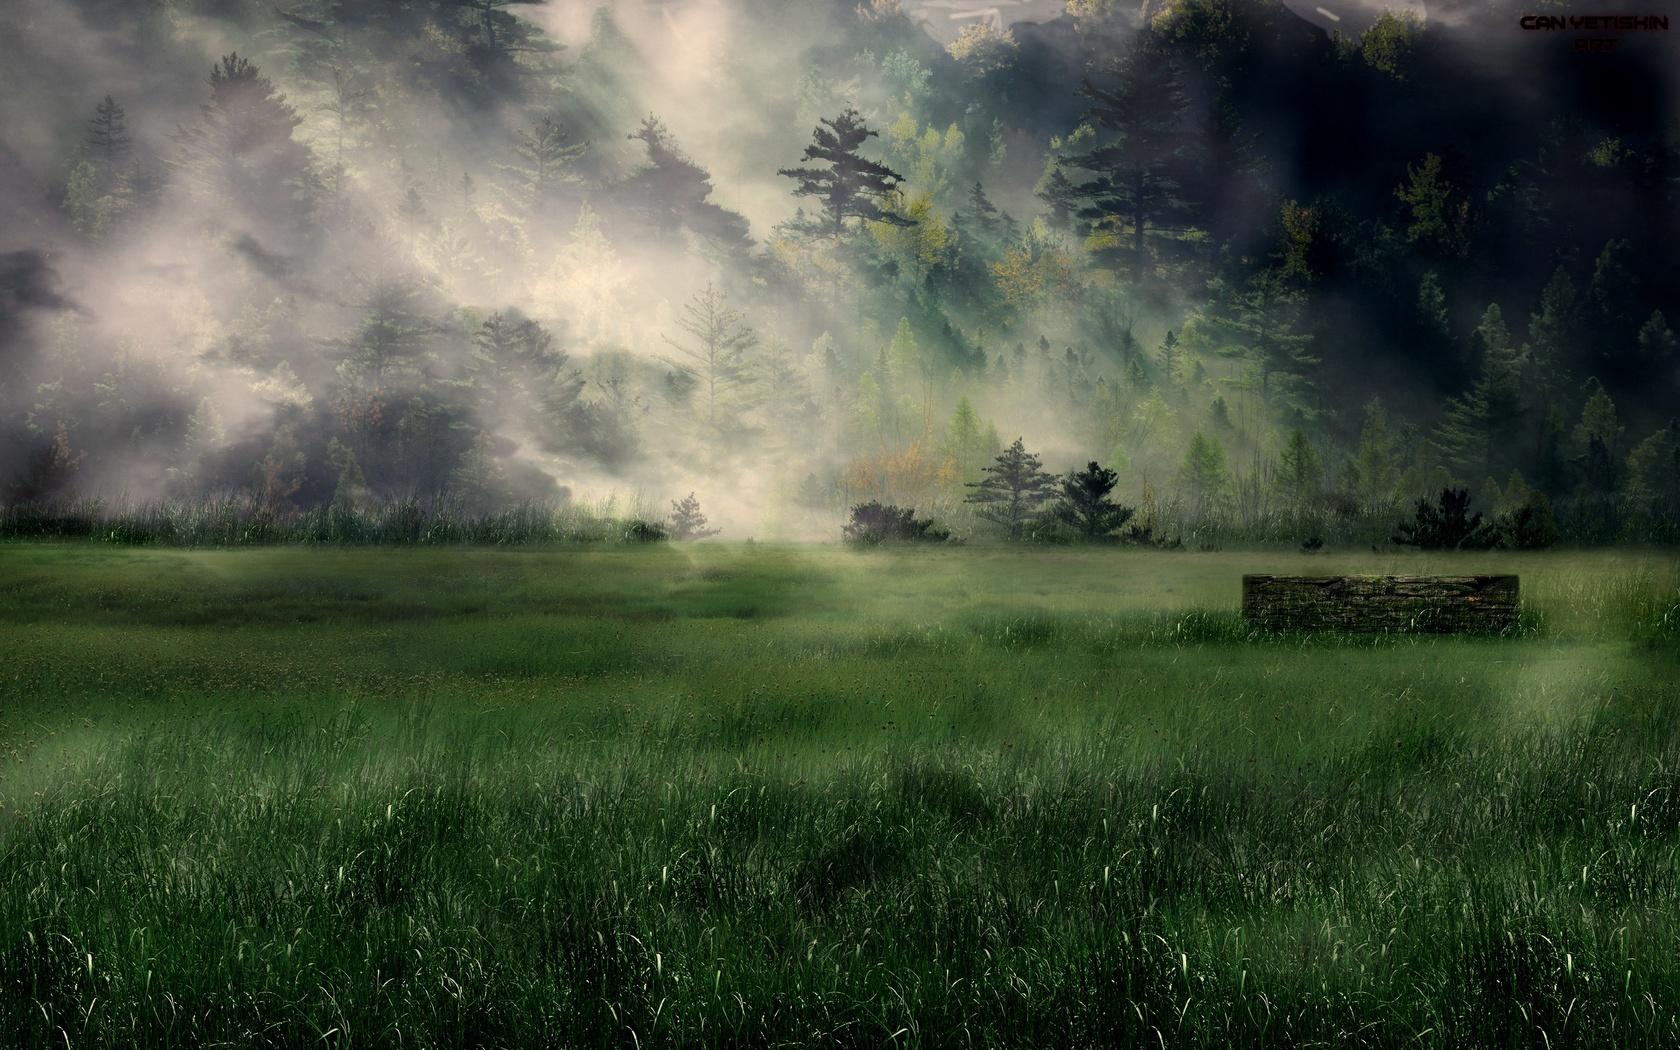 лес, деревья, туман, природа